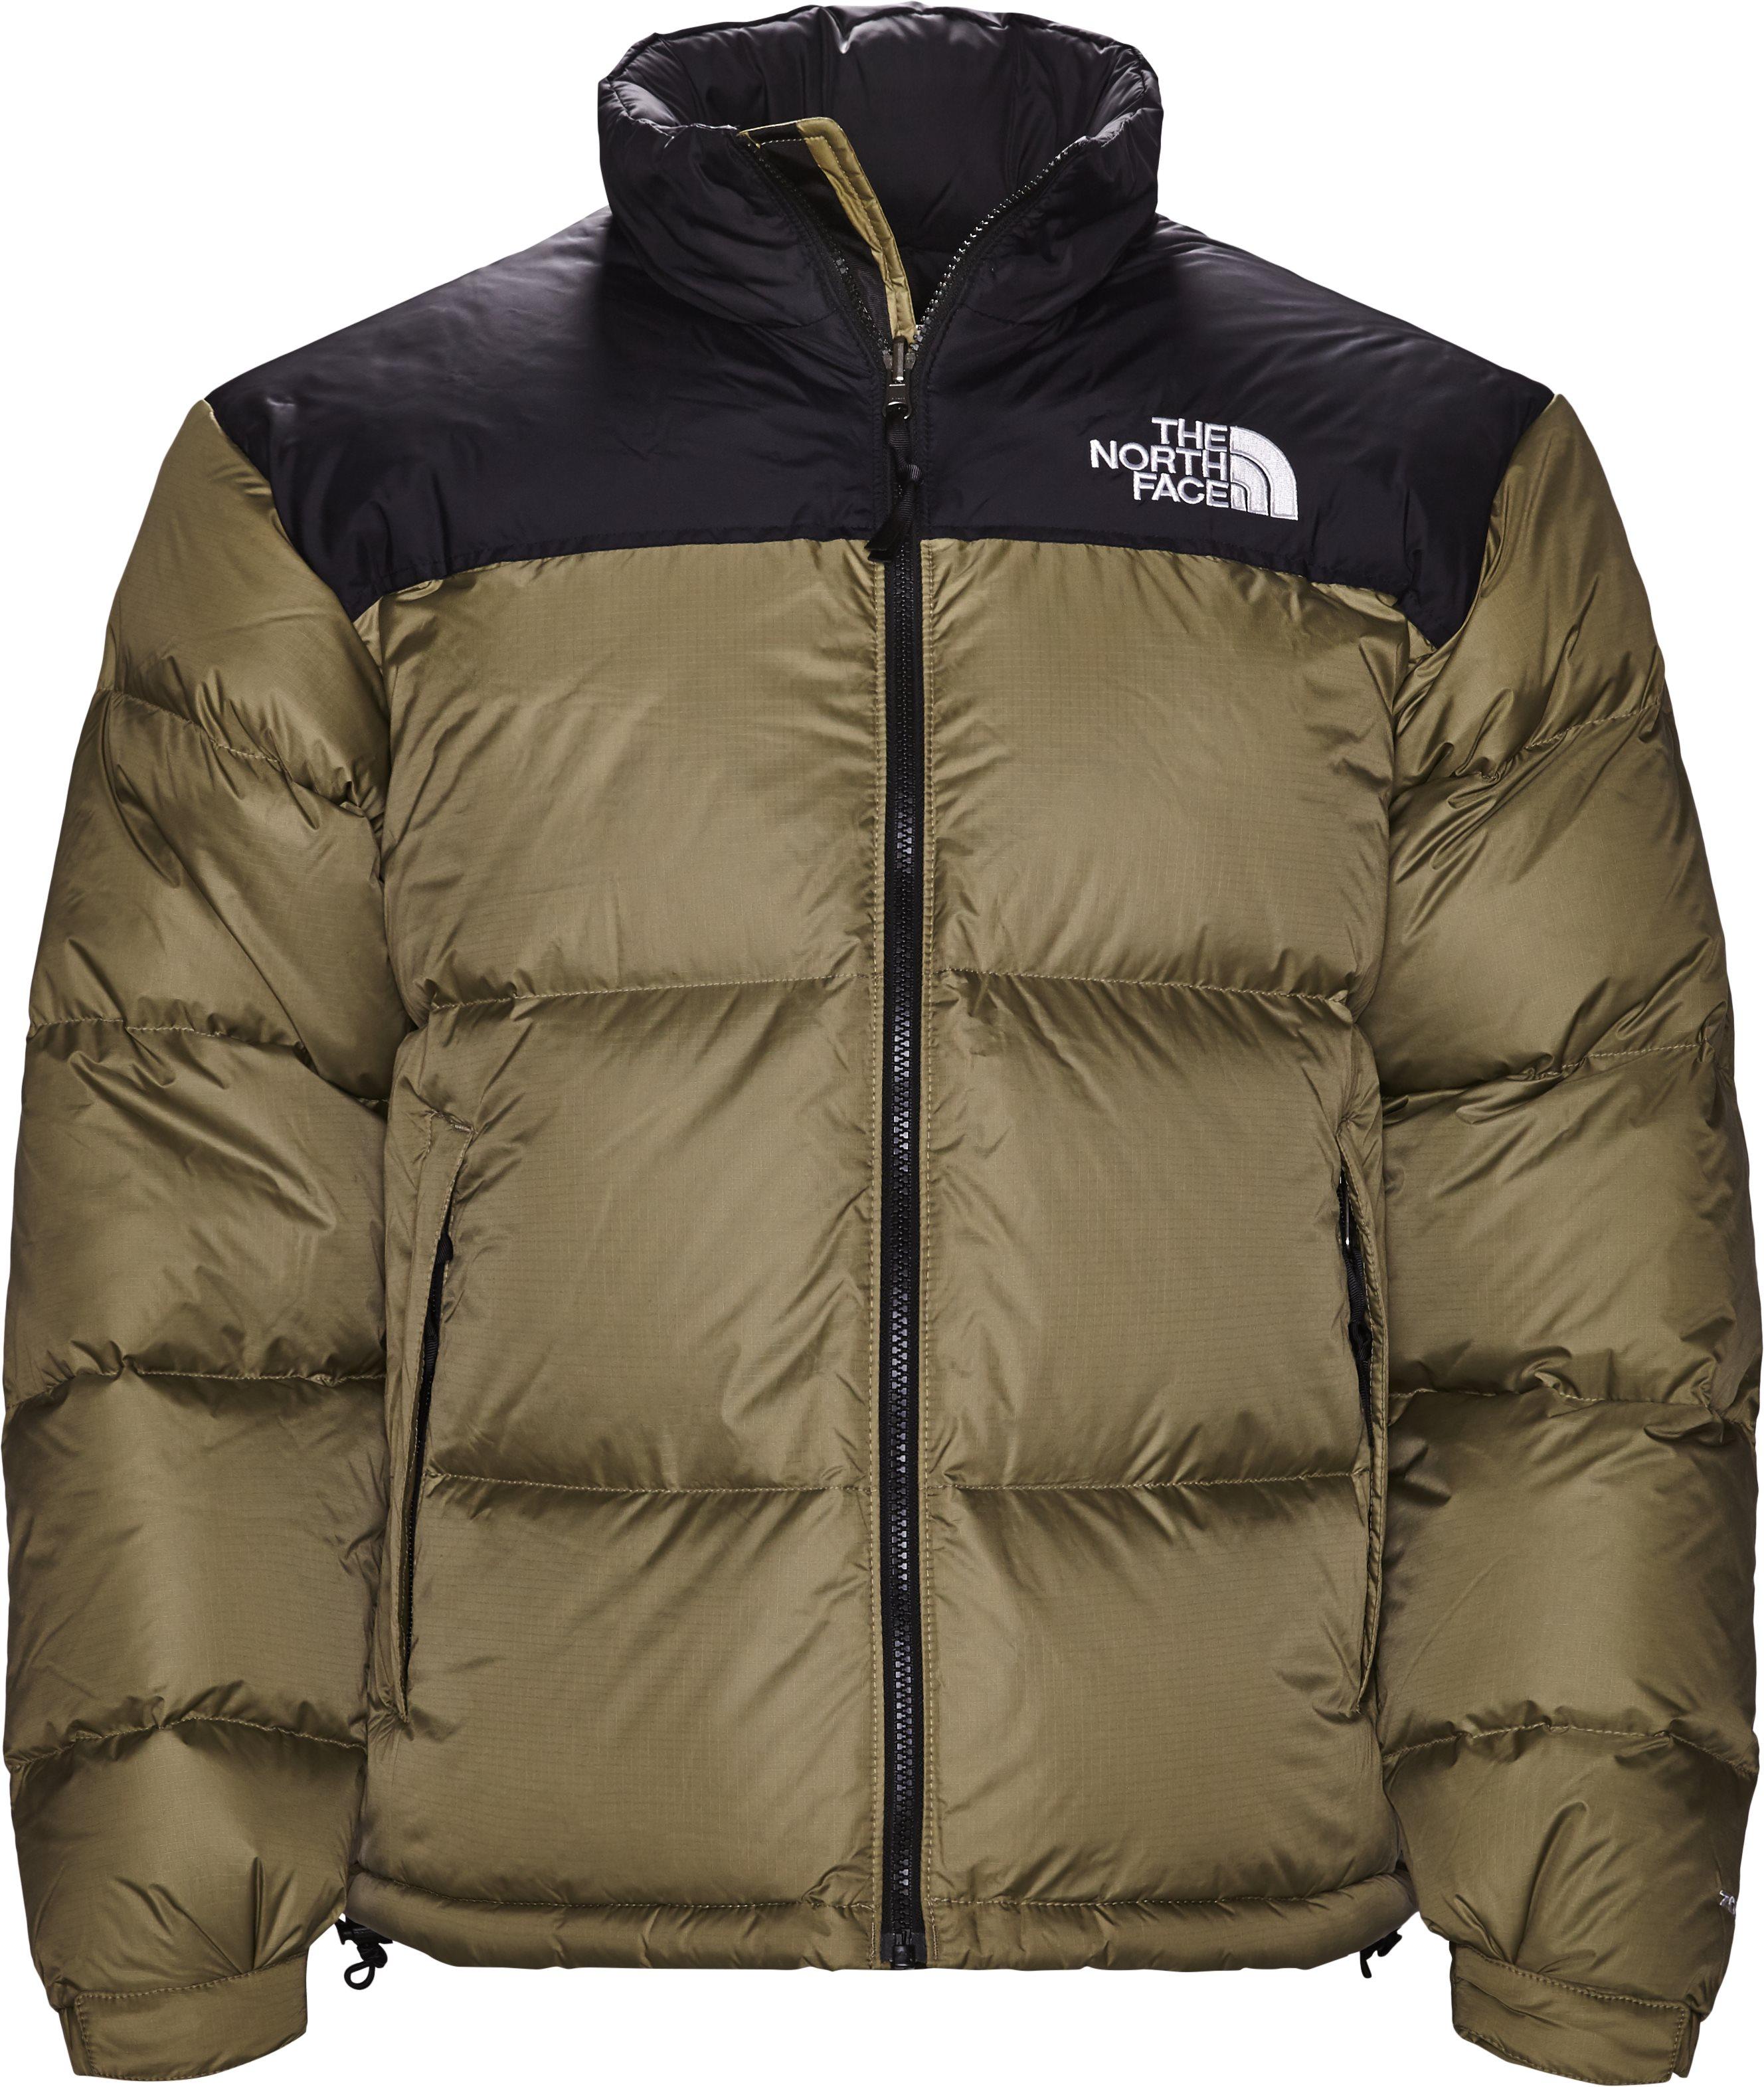 Jackets - Regular fit - Green